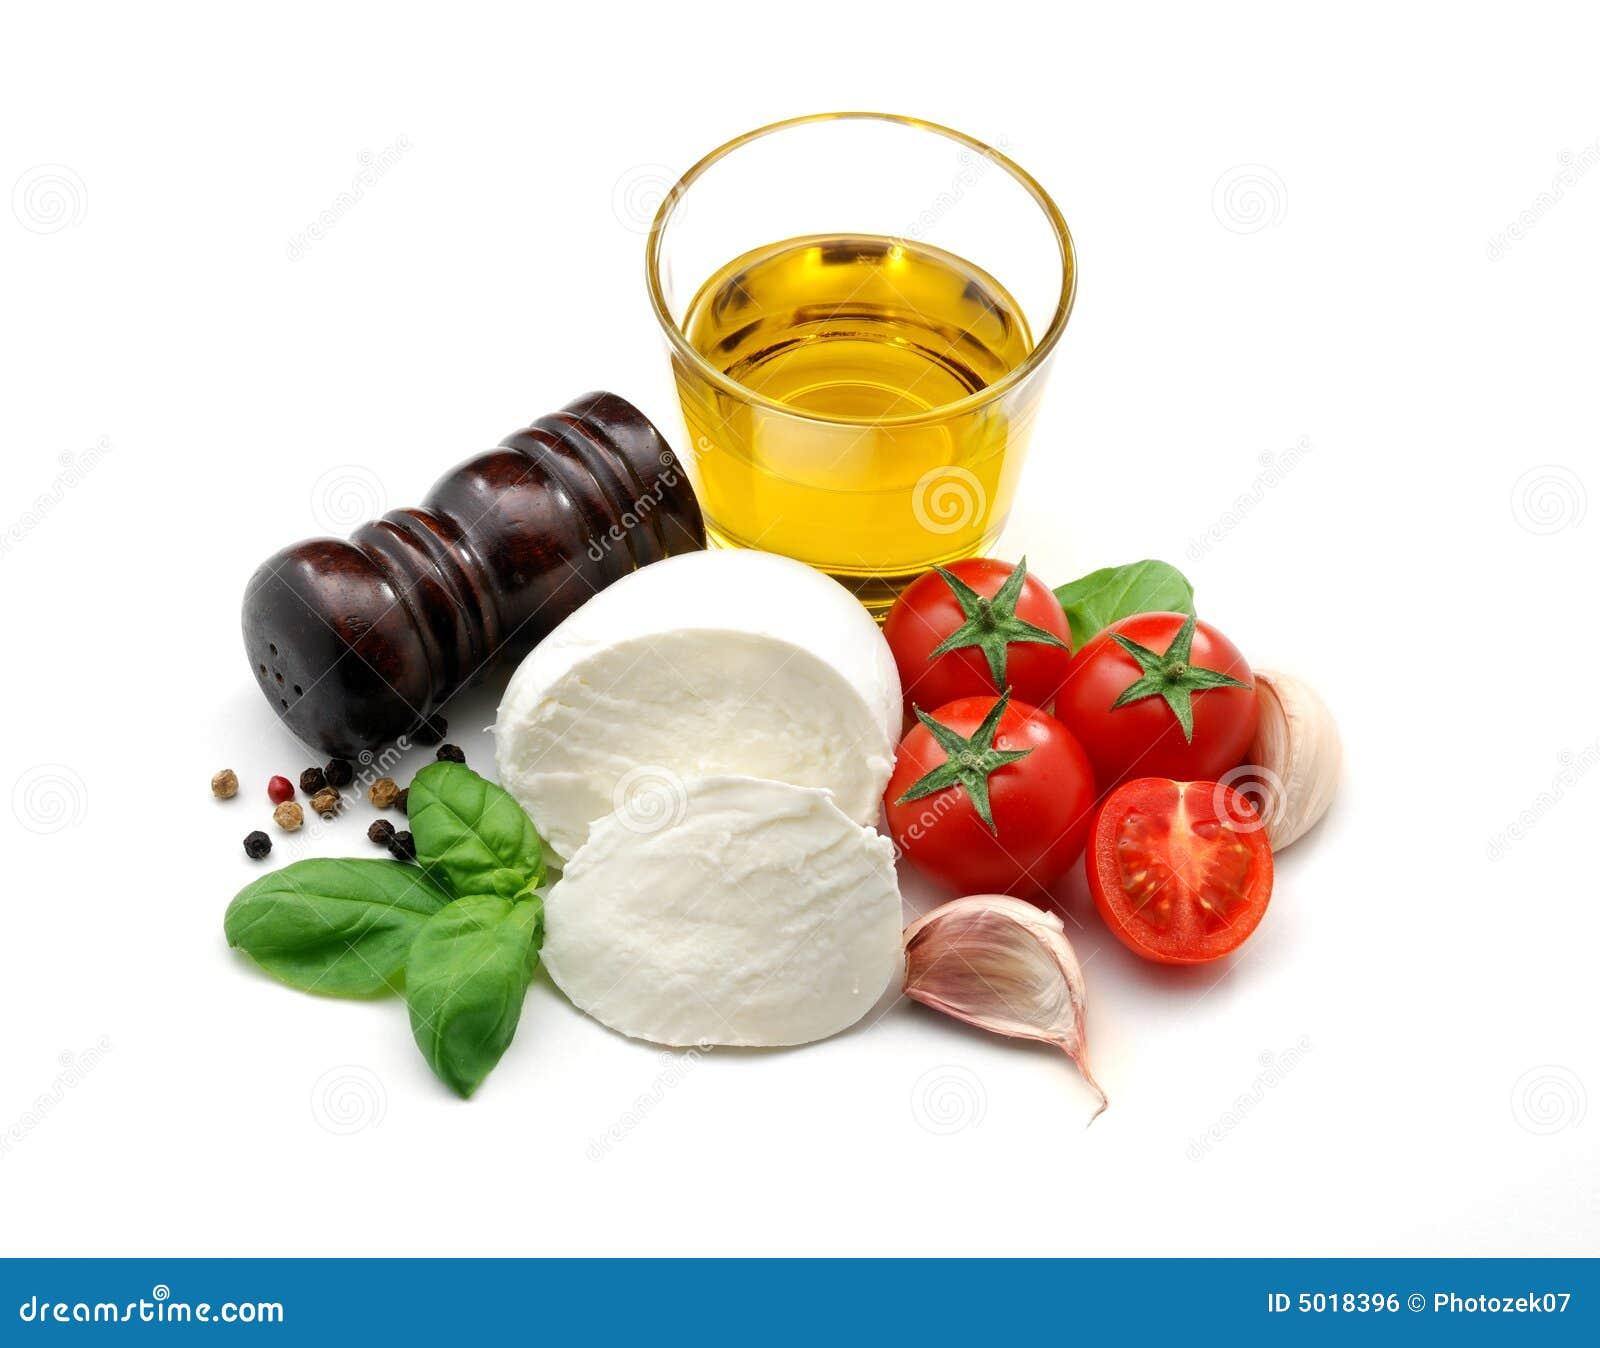 Olive oil, mozzarella, tomatoes, basil and garlic